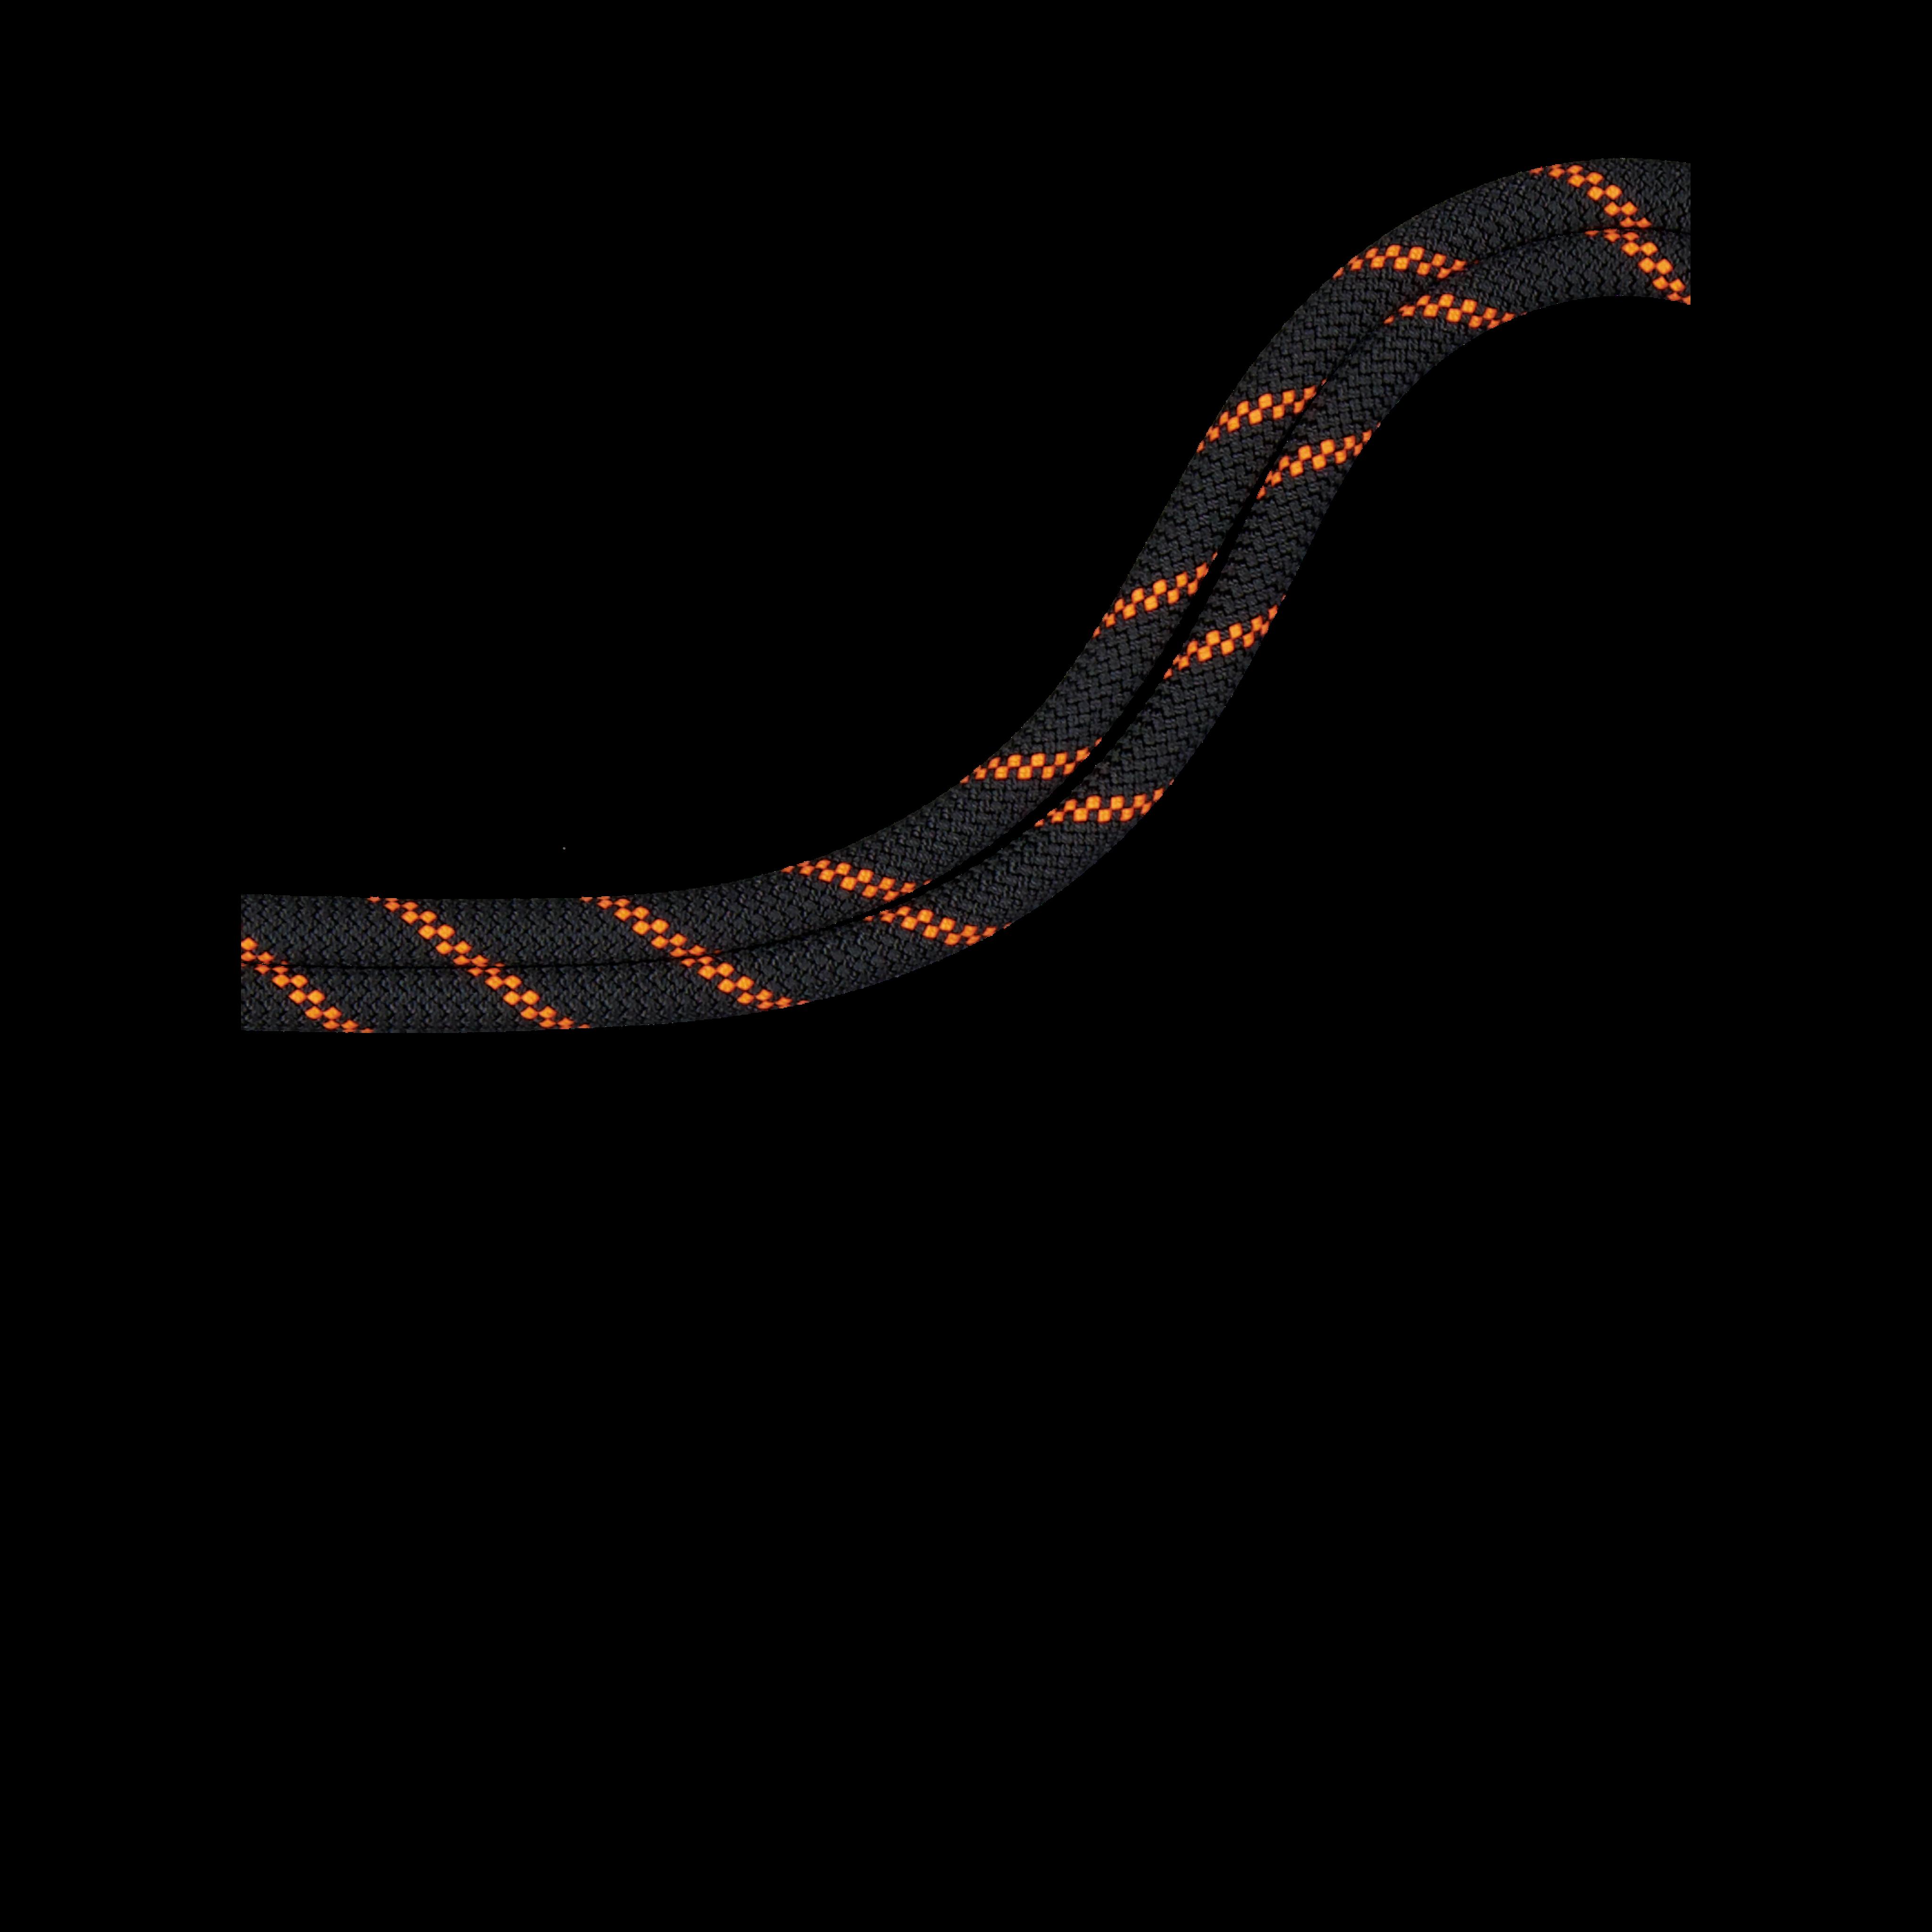 8.7 Alpine Sender Dry Rope product image